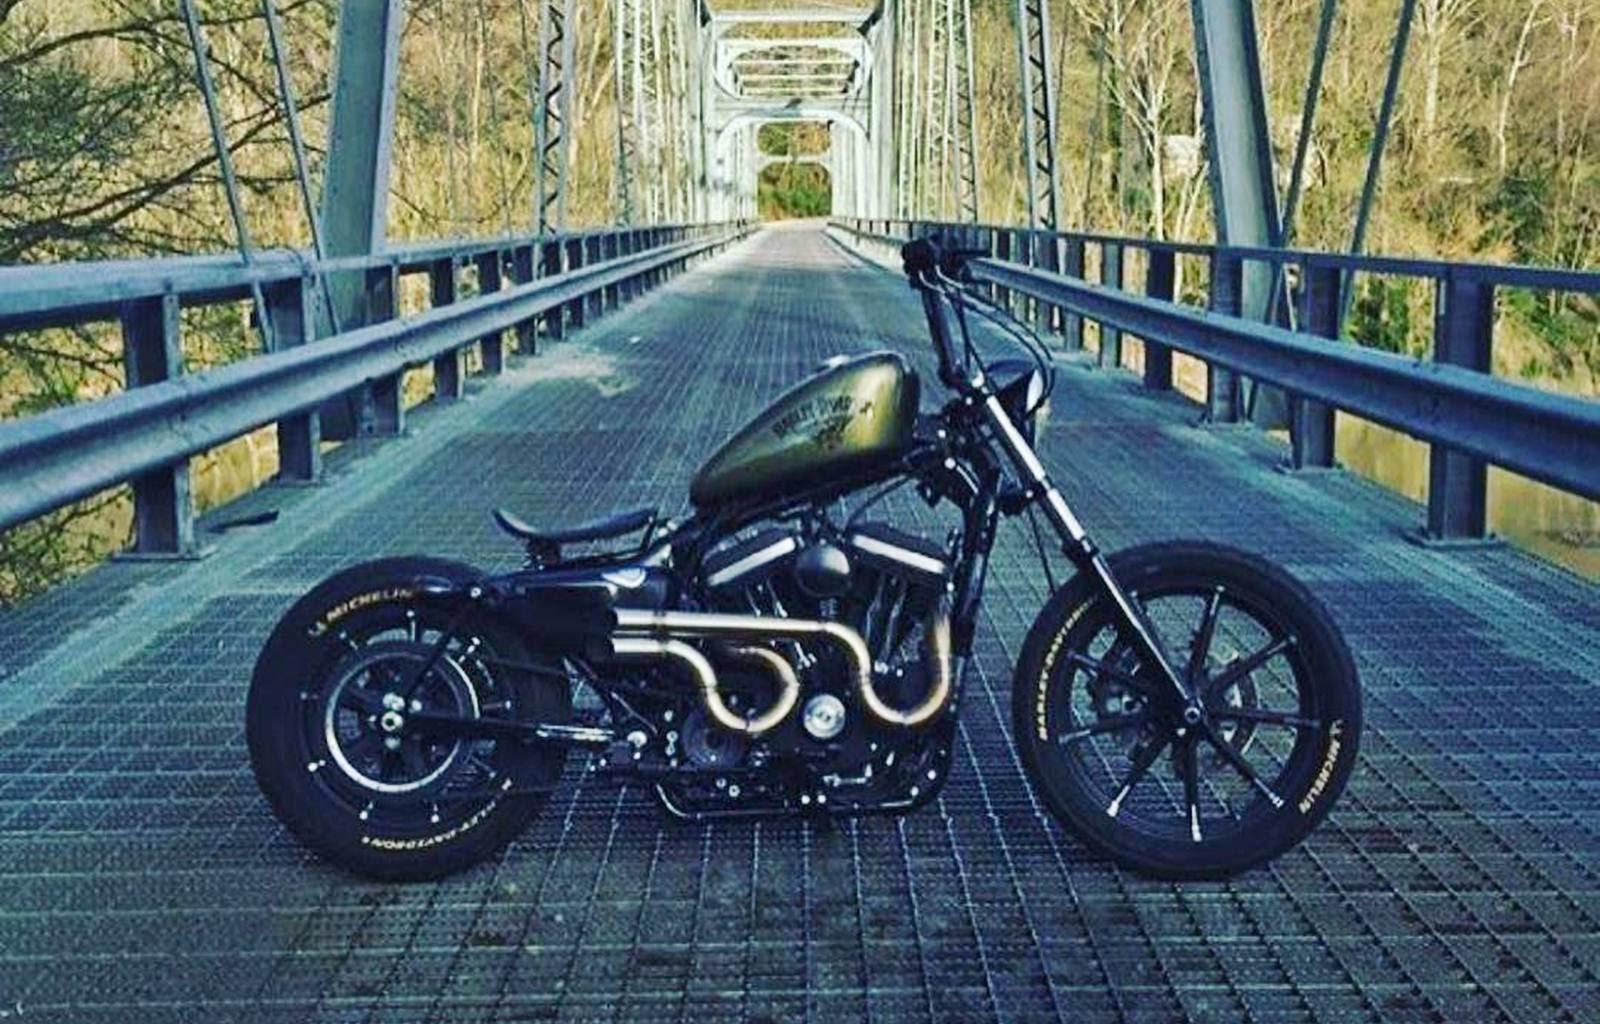 10 Gambar Wallpaper Motor Harley Davidson Ukuran 1600x1024 Terbaru Paling Keren Untuk Desktop PC Komputer Laptop